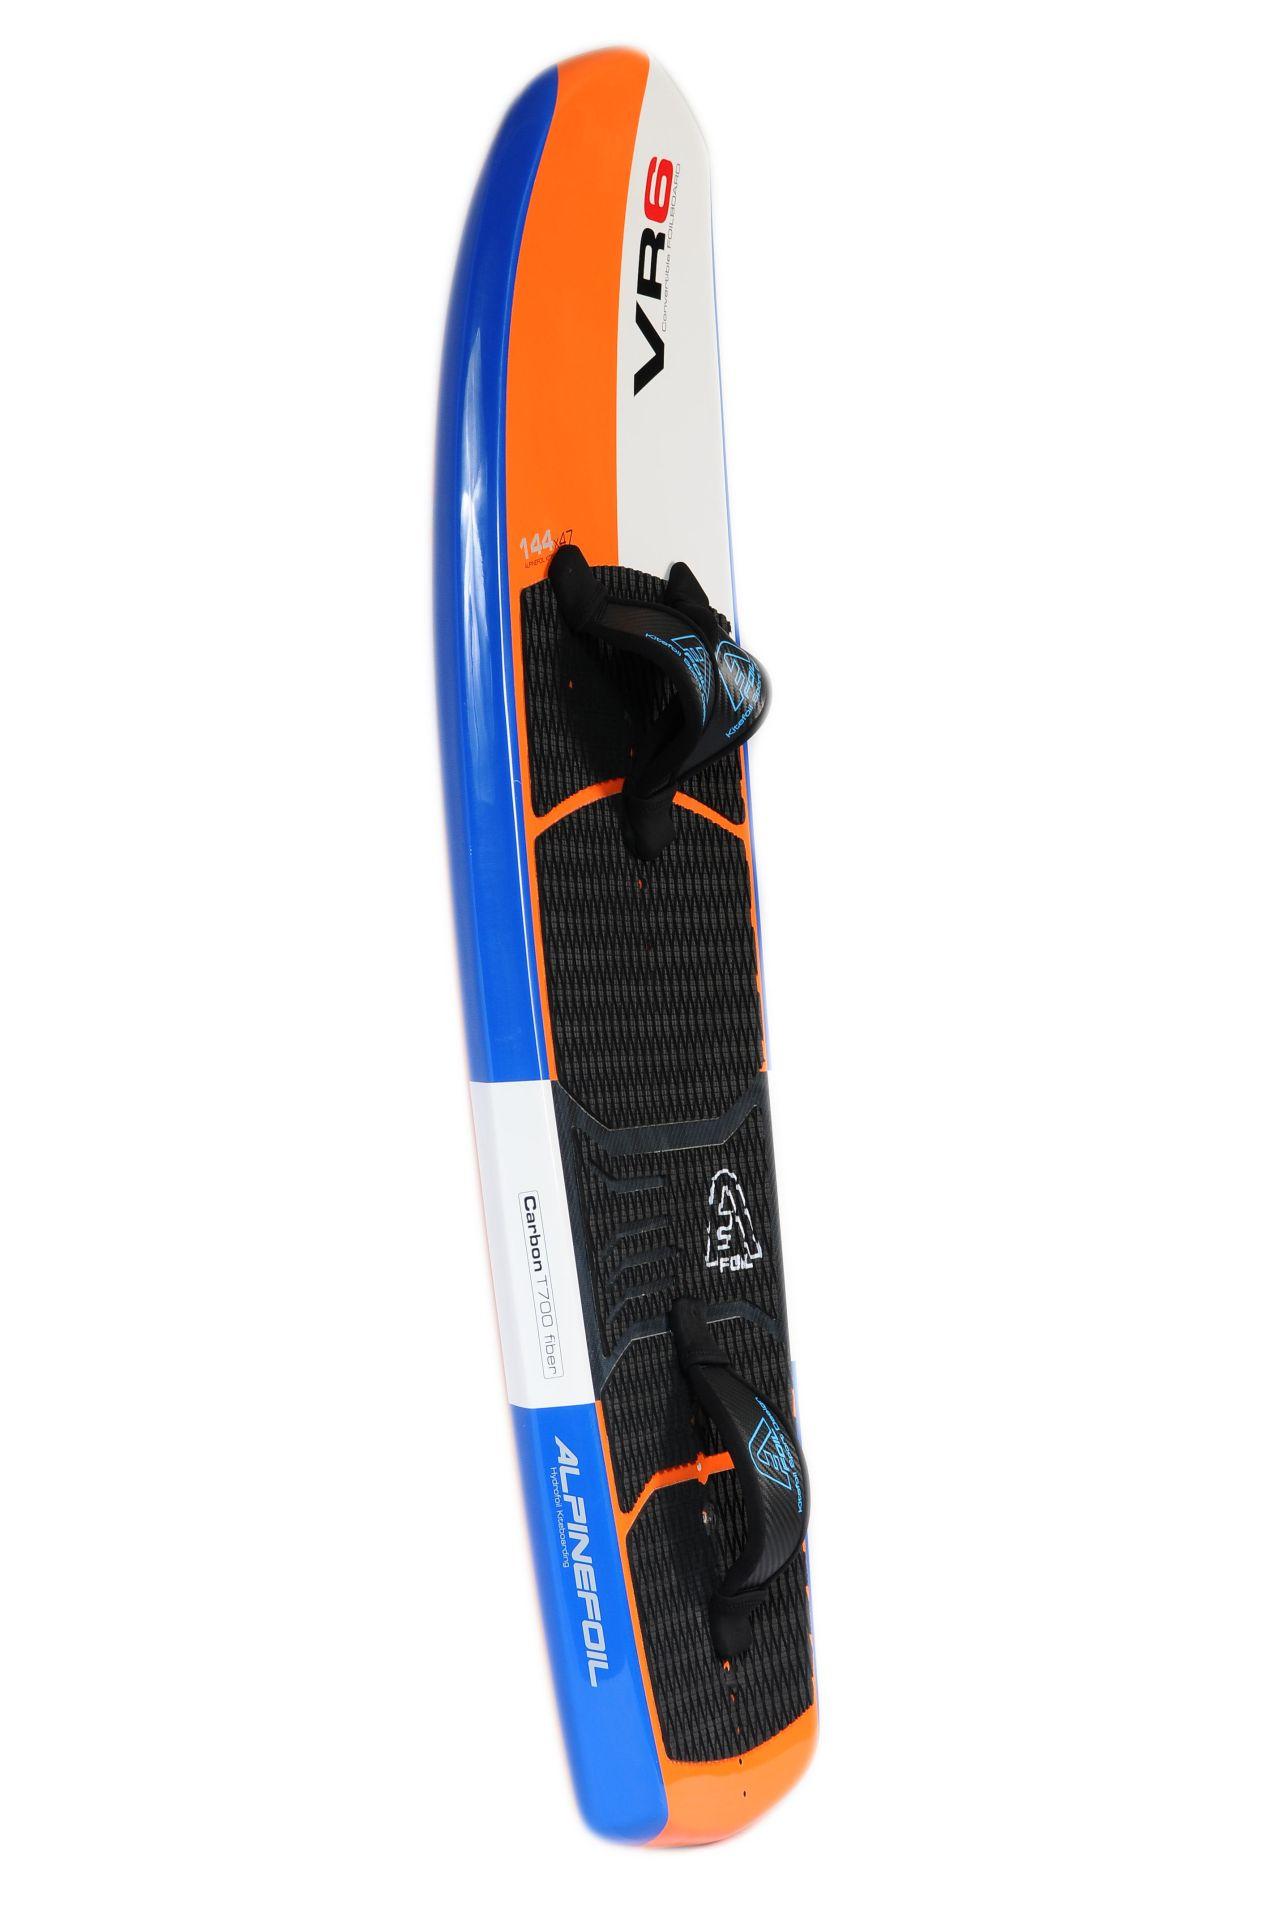 Kitefoil foilboard alpinefoil vr6 1 1